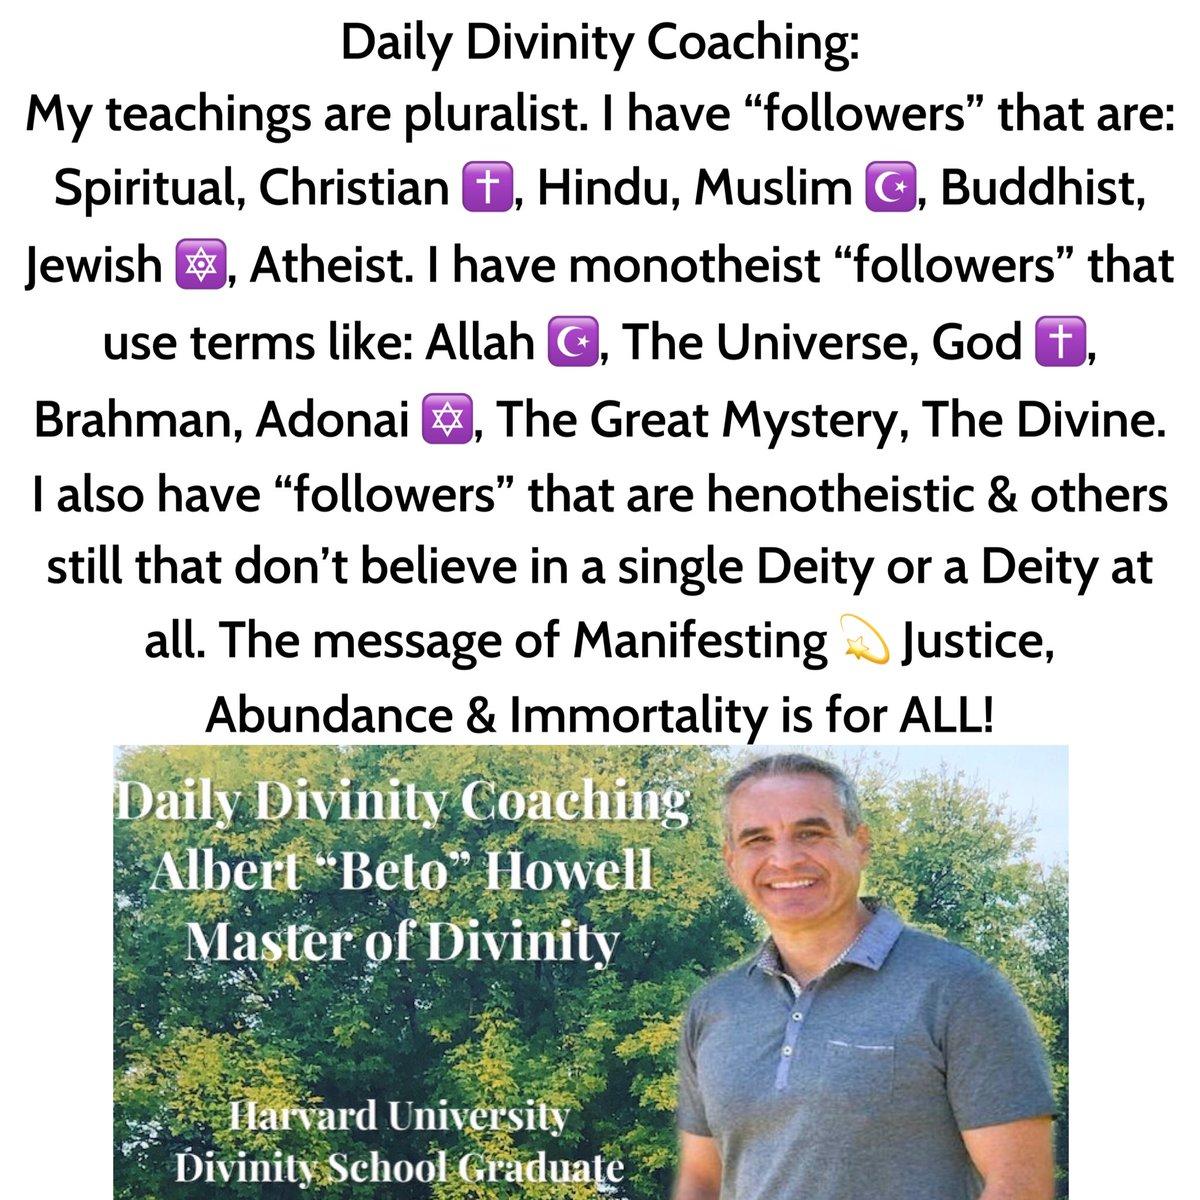 Daily Divinity Coaching for Today.  #manifestmiracles #spiritualinspiration #fifthsun  #manifestmoney #mexica #blacklivesmatter #lawofabundance #justiceforgeorgefloyd #justiceforbreonnataylor #chicanomovement #lawofattraction #justiceforahmaudarbery https://t.co/gNPUSKzDbI